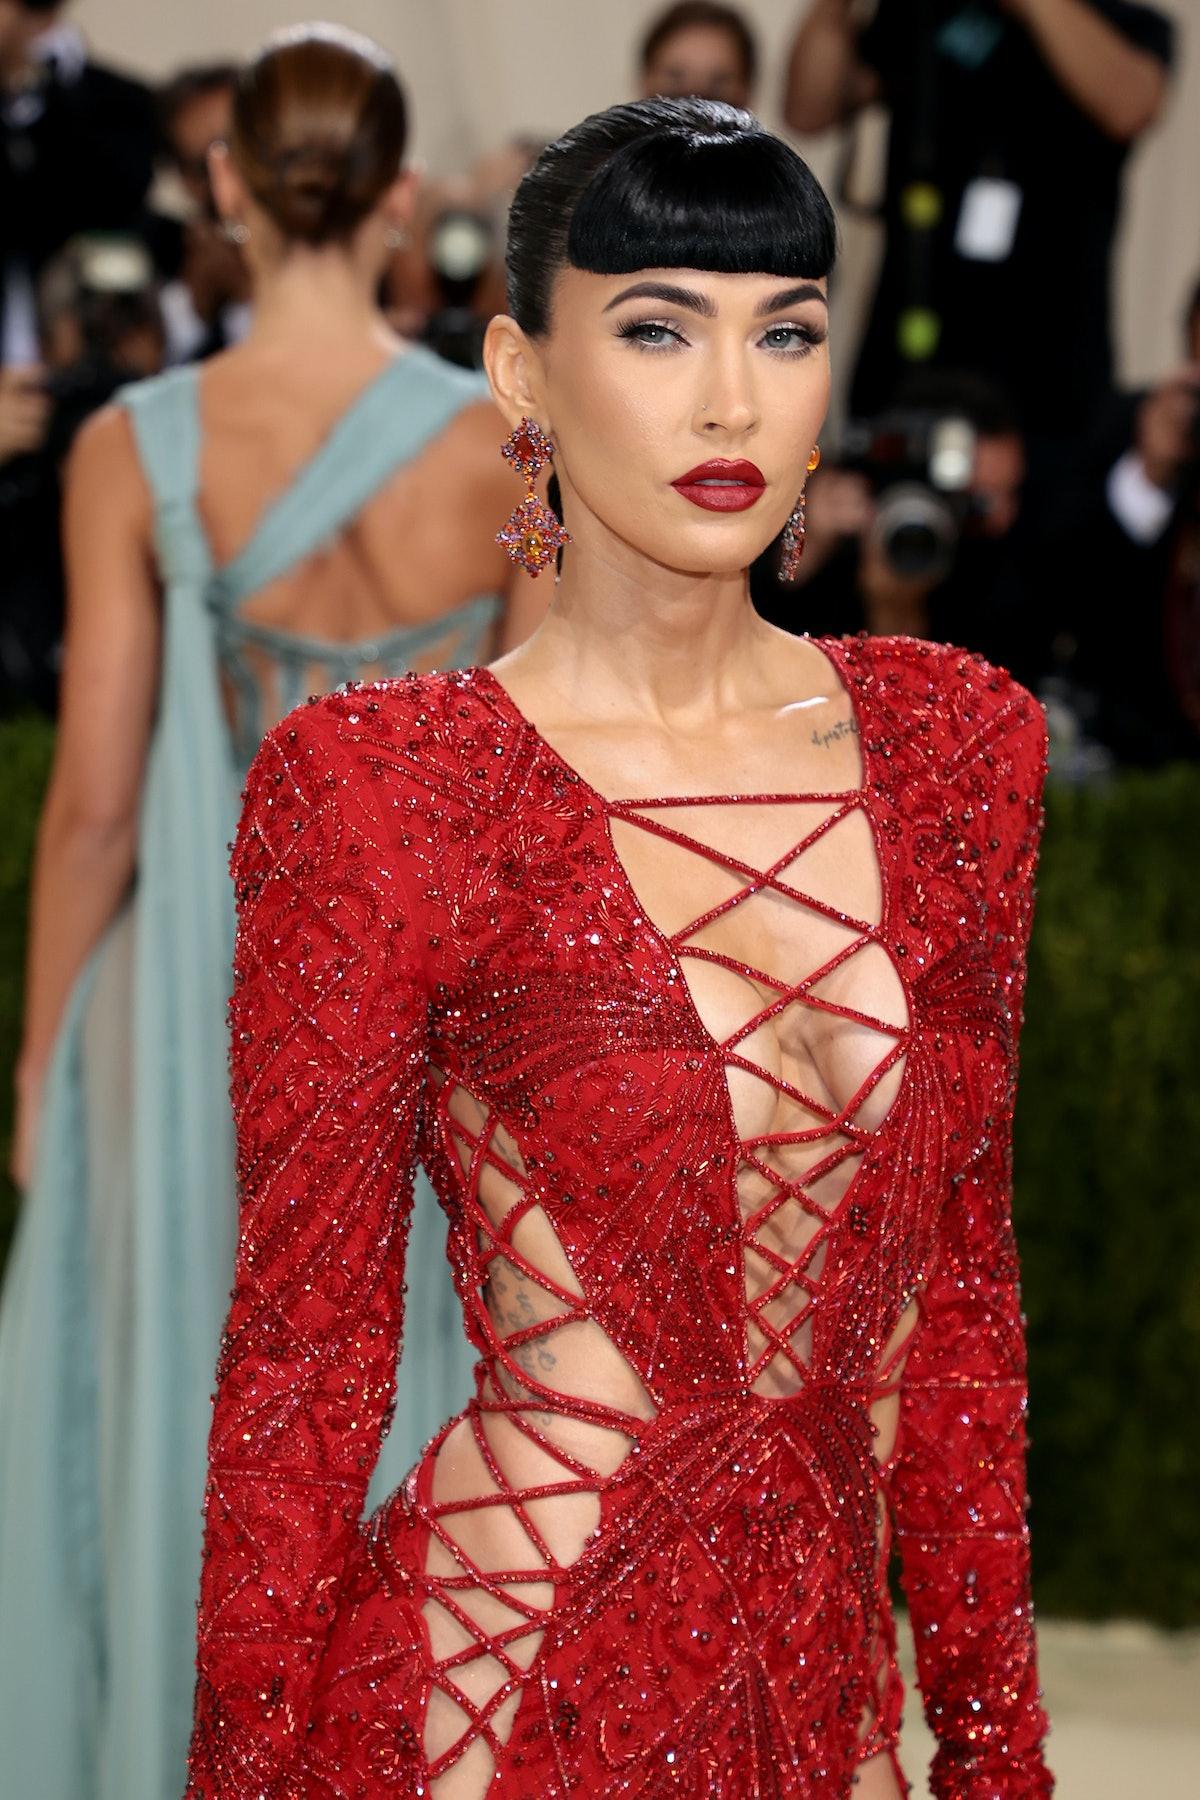 Megan Fox wears Dundas to The 2021 Met Gala.